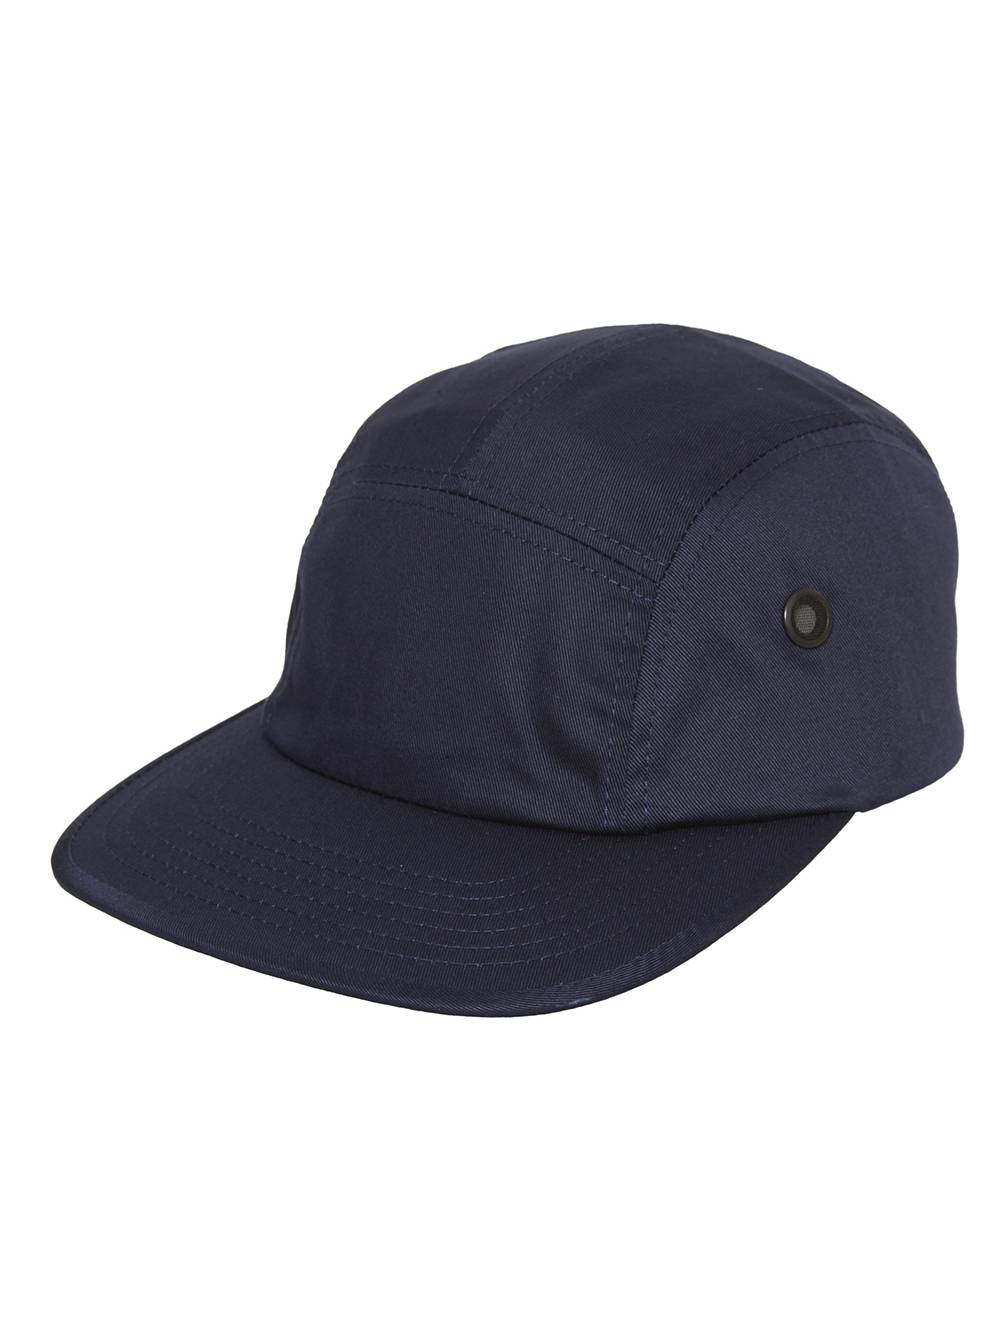 c537e4046b65e Topheadwear Military Street Urban Cap- Olive